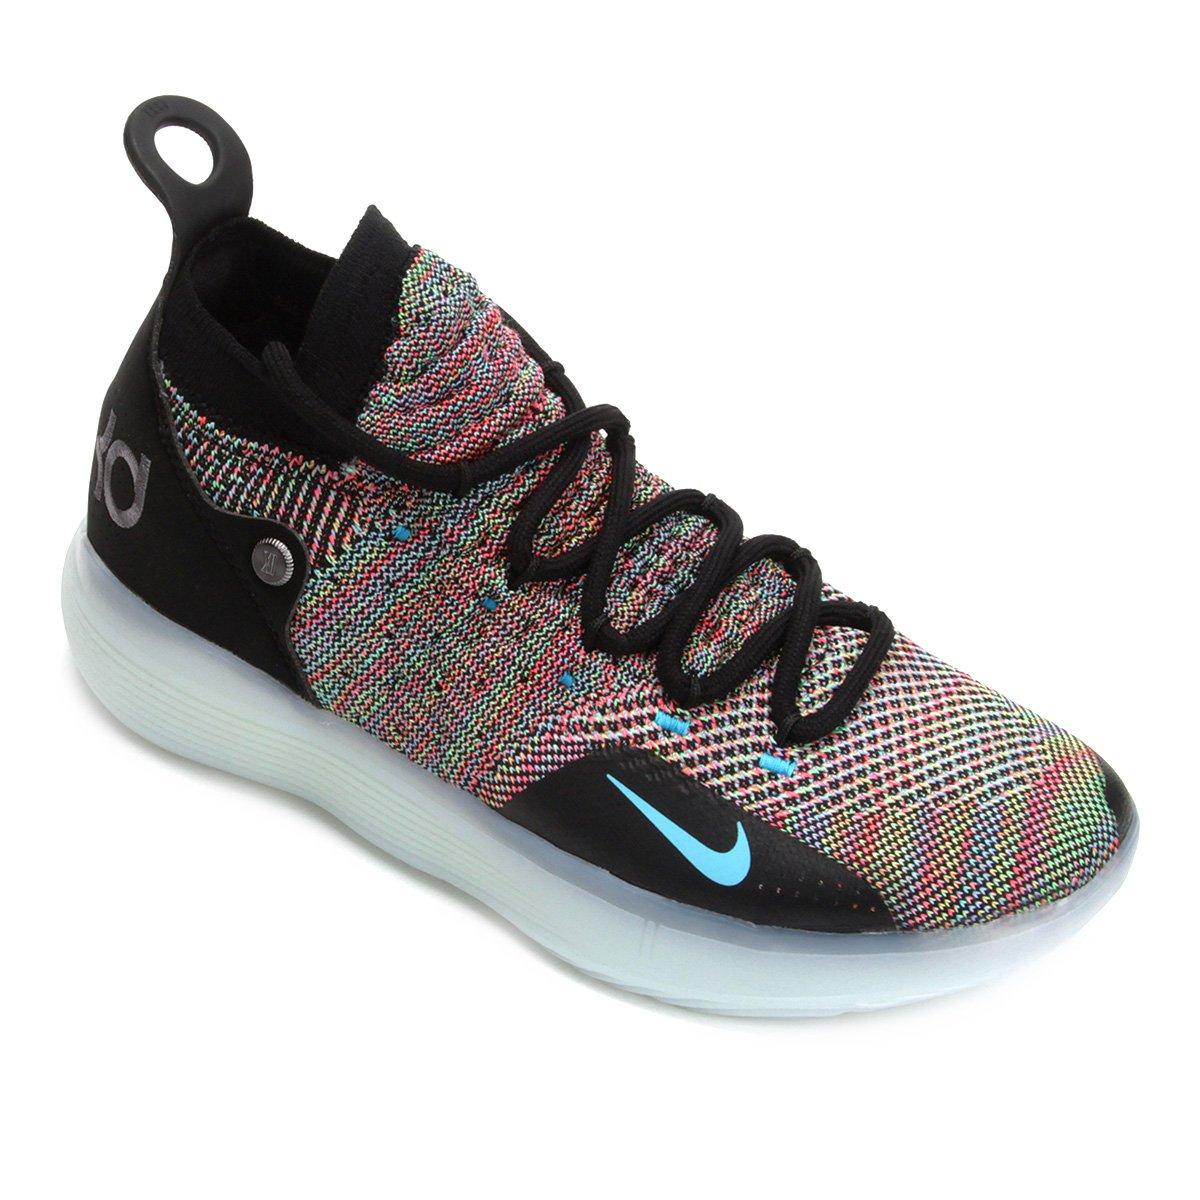 582e75601d6f Tênis Nike Zoom KD 11 Masculino - Compre Agora